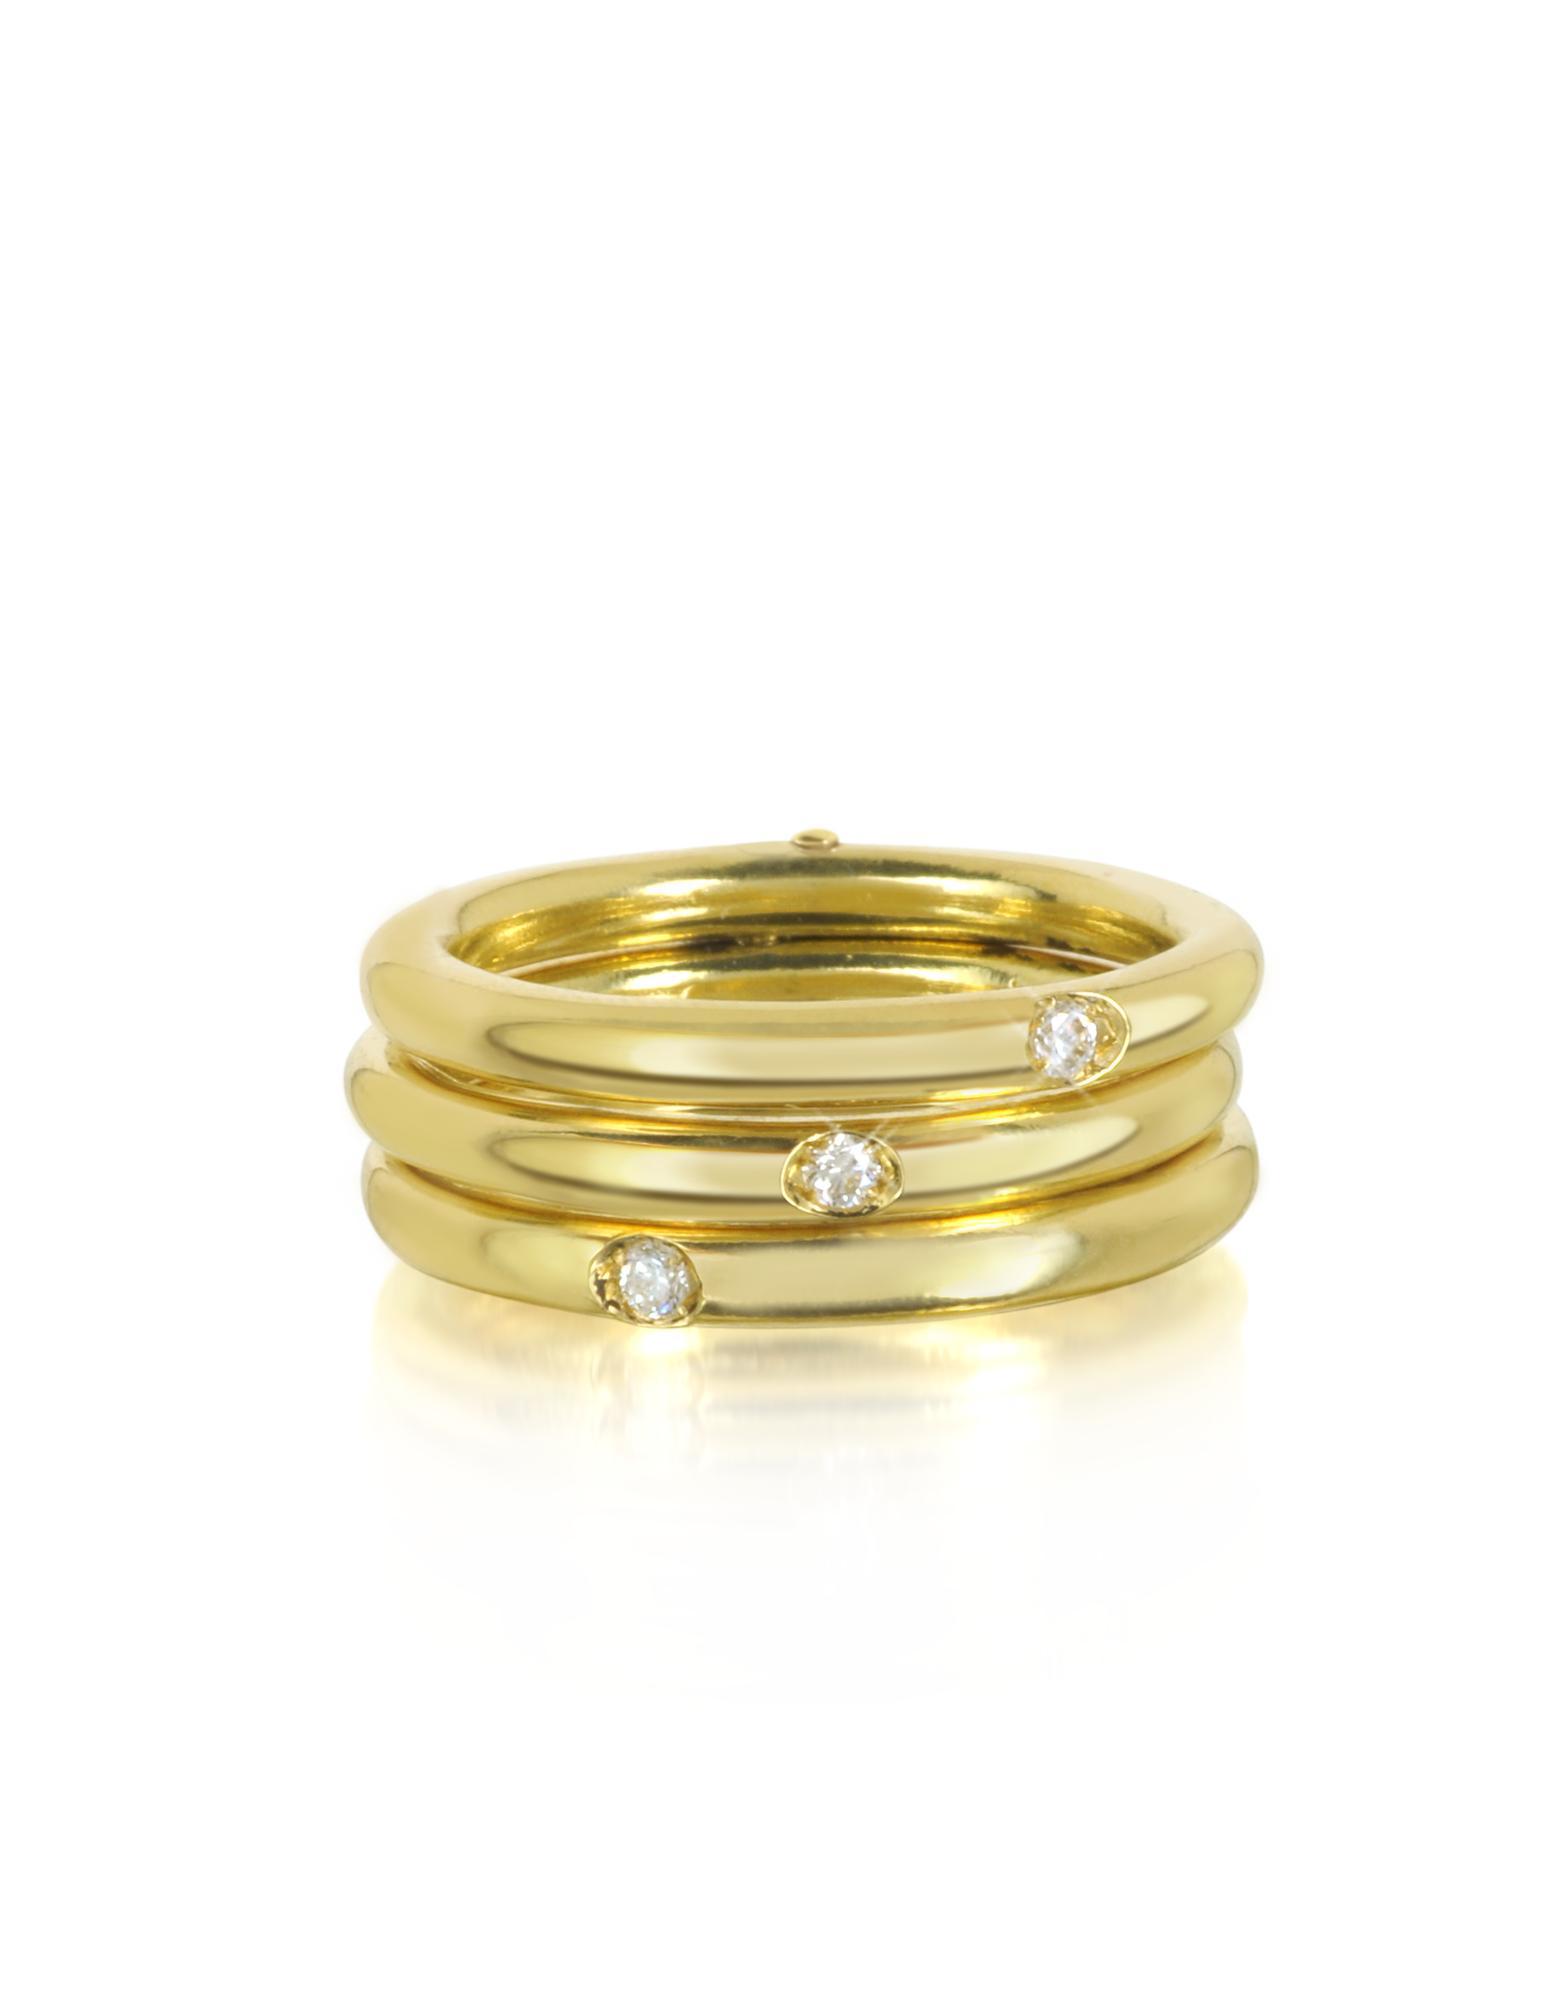 Bernard Delettrez Triple Secret Ring aus 9k Gold mit Diamanten